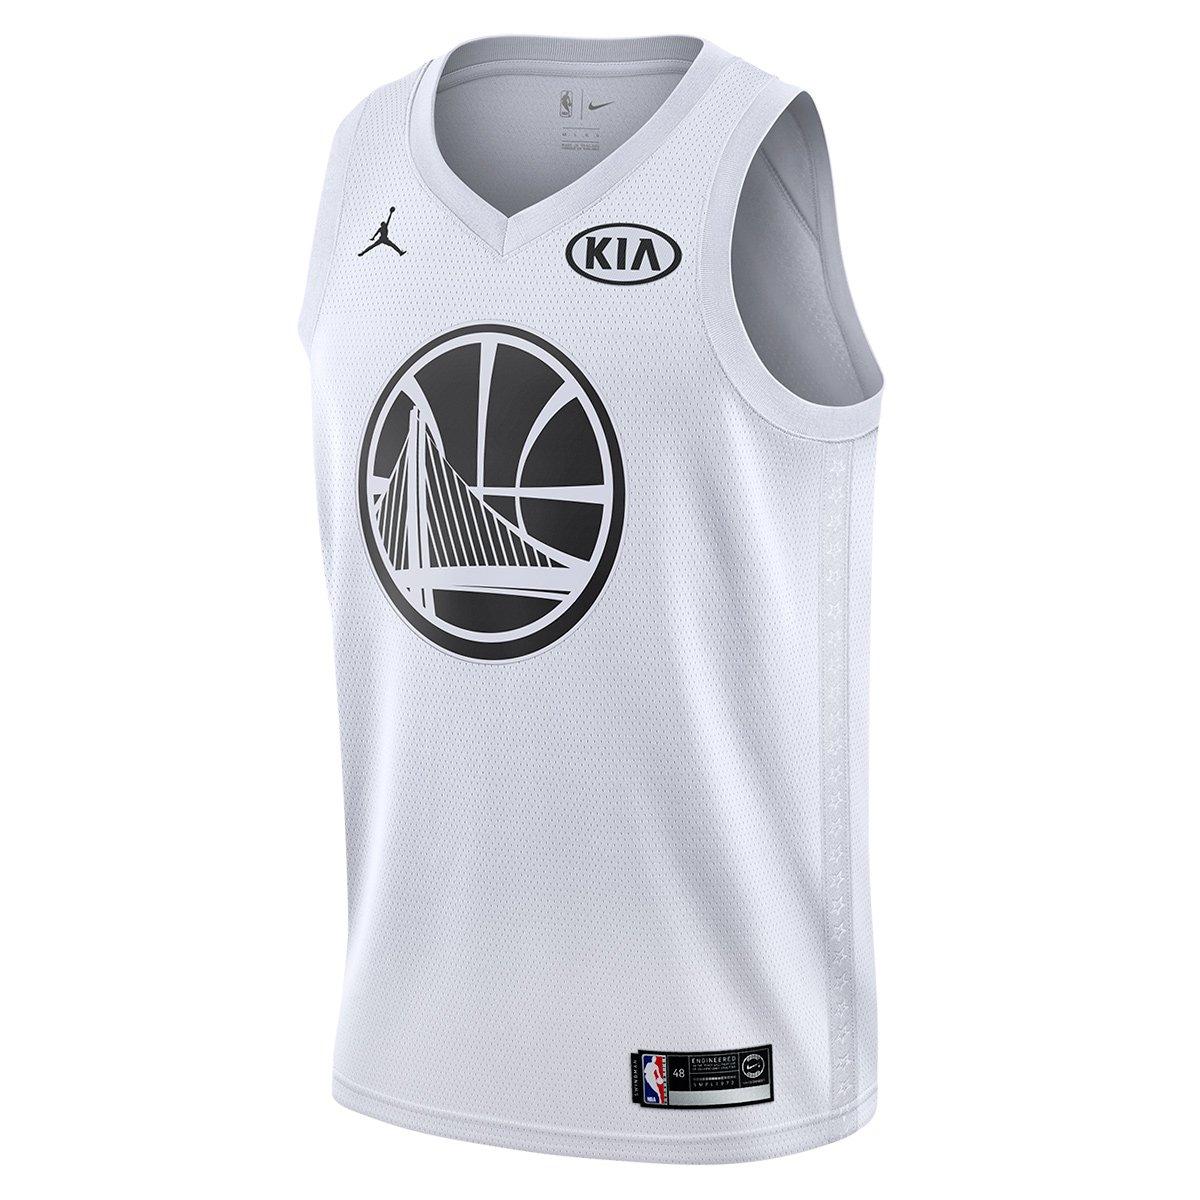 91534e5ad Regata Swingman NBA Stephen Curry All Star Games JSY West 2018 Nike -  Compre Agora